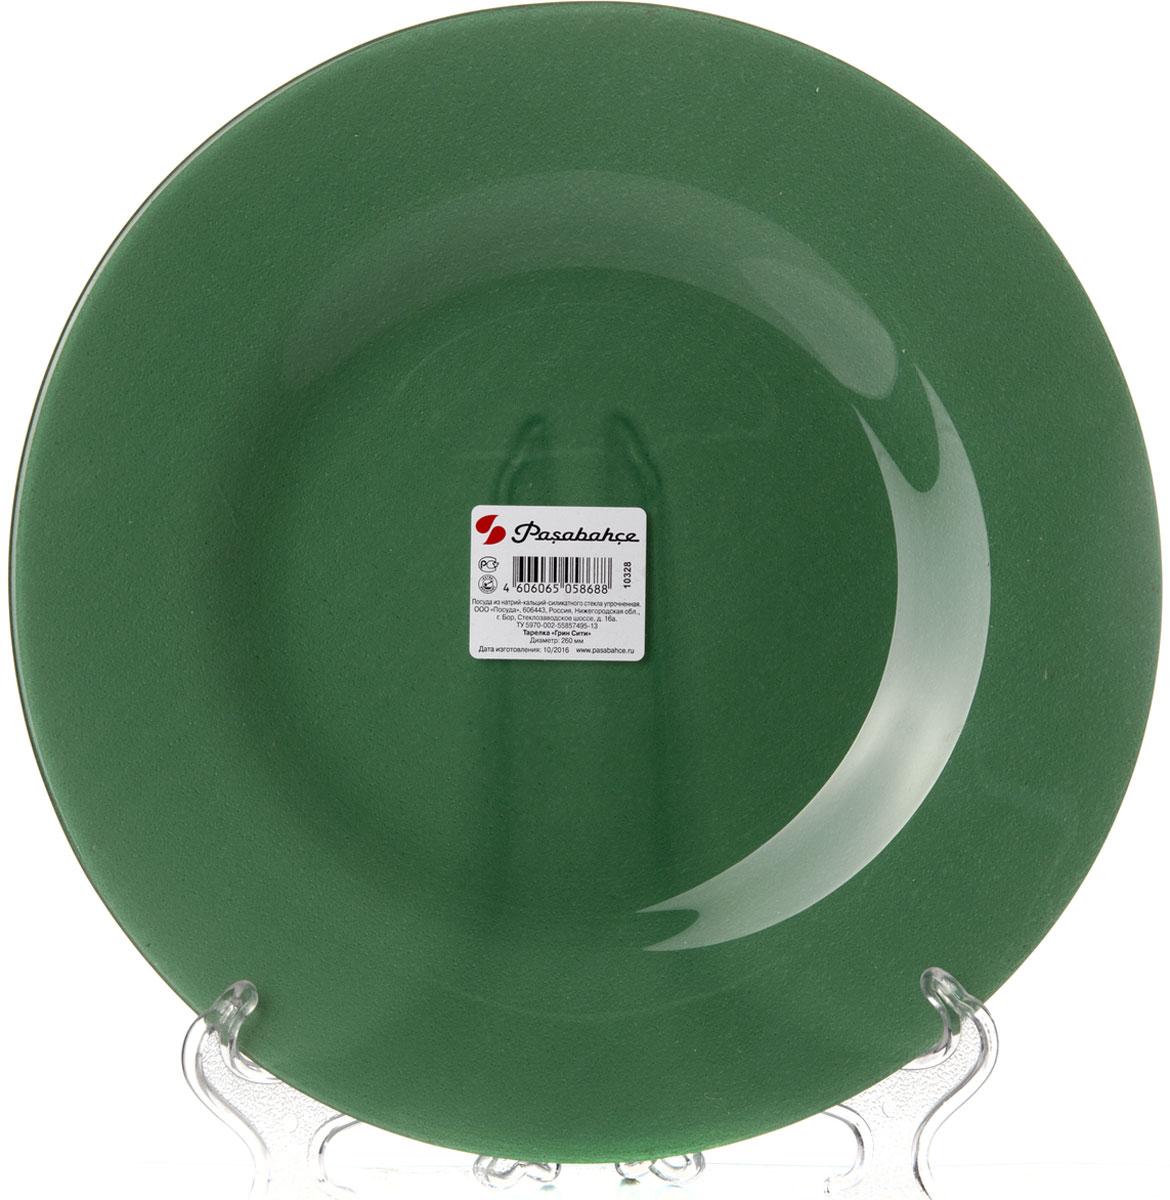 Тарелка Pasabahce Грин Сити, цвет: зеленый, диаметр 26 см10328SLBD38Тарелка из упрочненного стекла d=260 мм